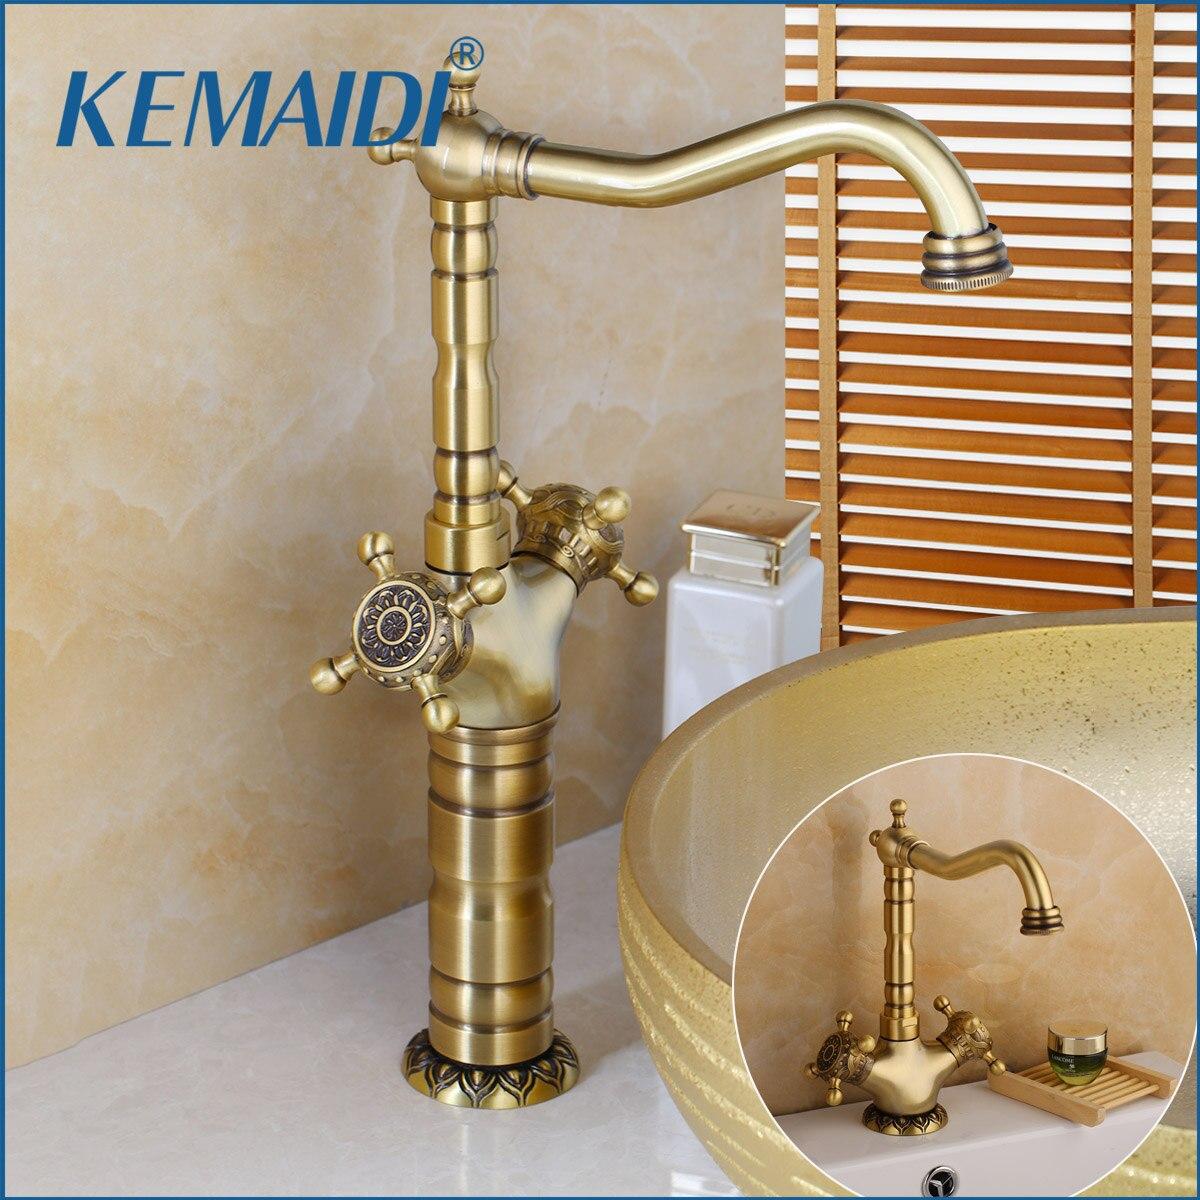 KEMAIDI Elegant Antique Brass Bathroom Sink Faucets Long&Short 360 Swivel Mixer Taps Vanity Brass Faucet  Mixer Tap FaucetsKEMAIDI Elegant Antique Brass Bathroom Sink Faucets Long&Short 360 Swivel Mixer Taps Vanity Brass Faucet  Mixer Tap Faucets